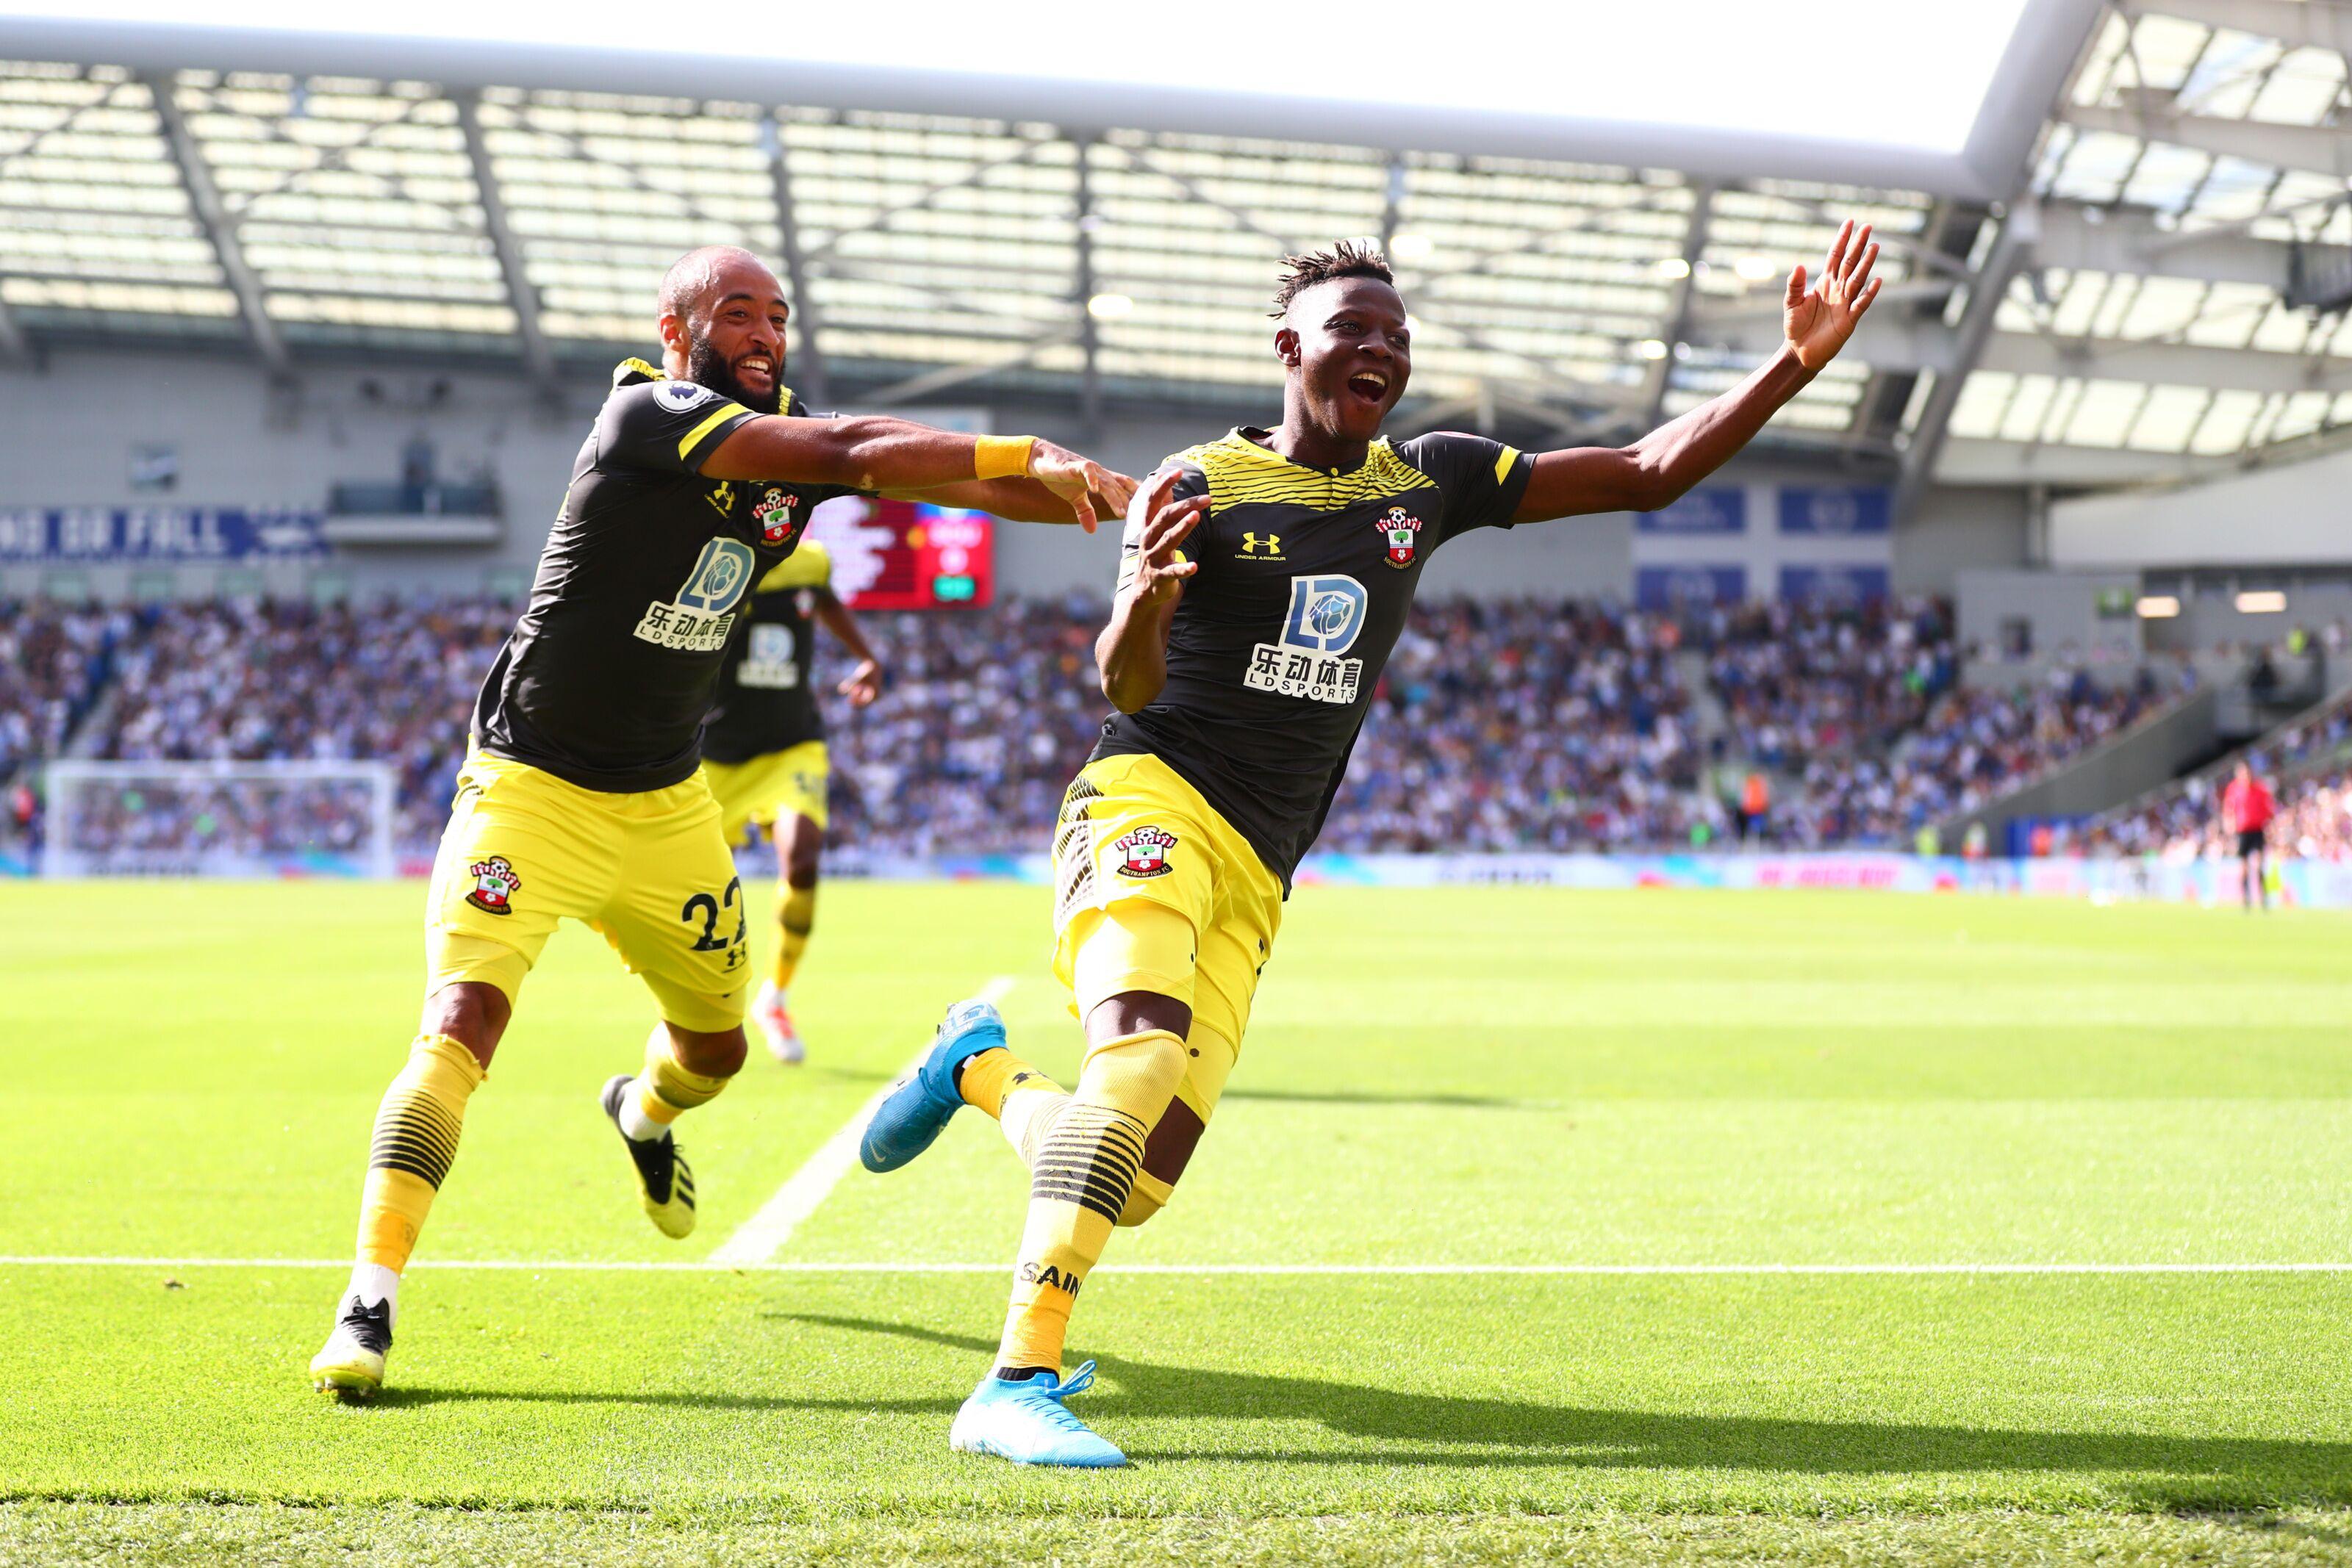 Brighton 0-2 Southampton: Djenepo and Redmond strikes earn Saints win over 10-man Seagulls